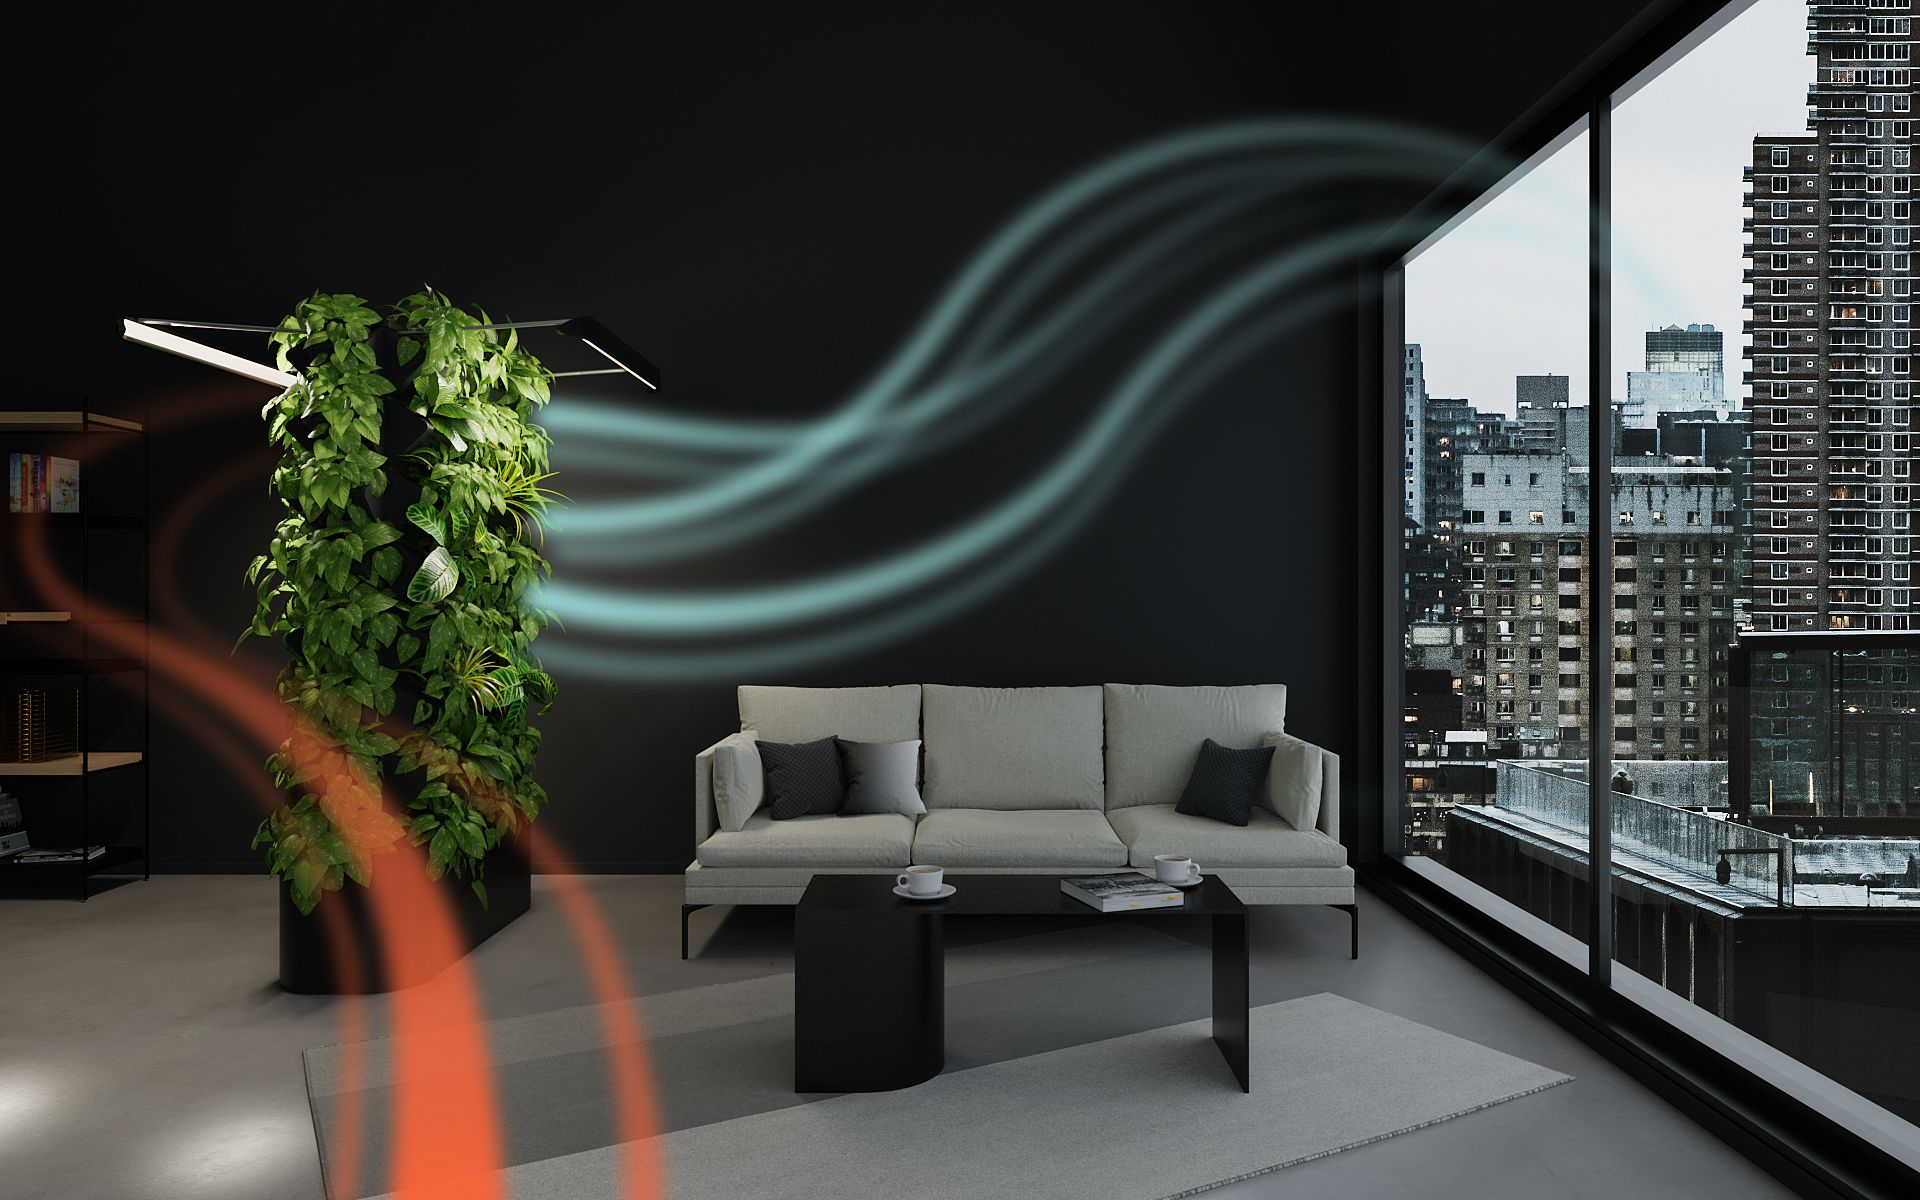 airflow-of-plantbot